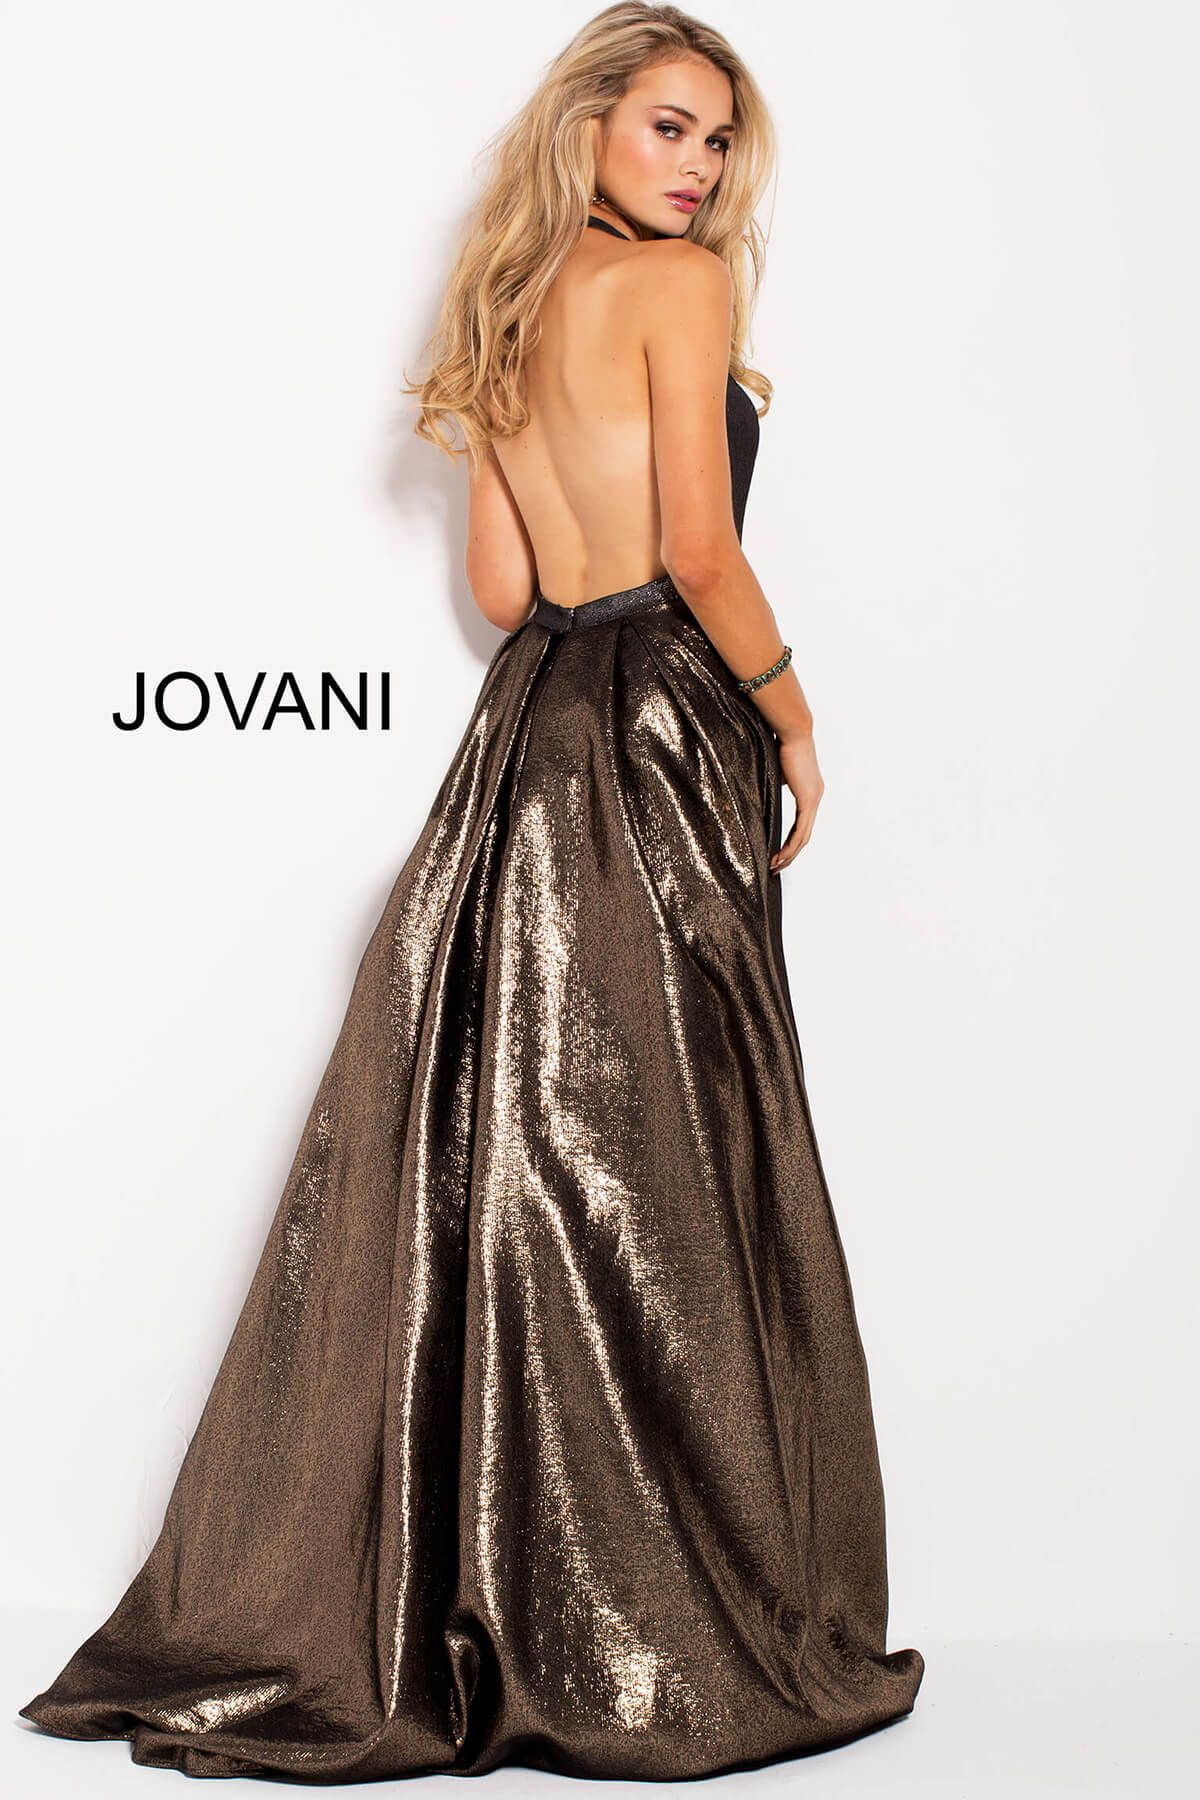 Jovani 57237 Gold Silver Metallic Halter A Line Prom Metallic Prom Dresses Backless Gown Backless Prom Dresses [ 1800 x 1200 Pixel ]